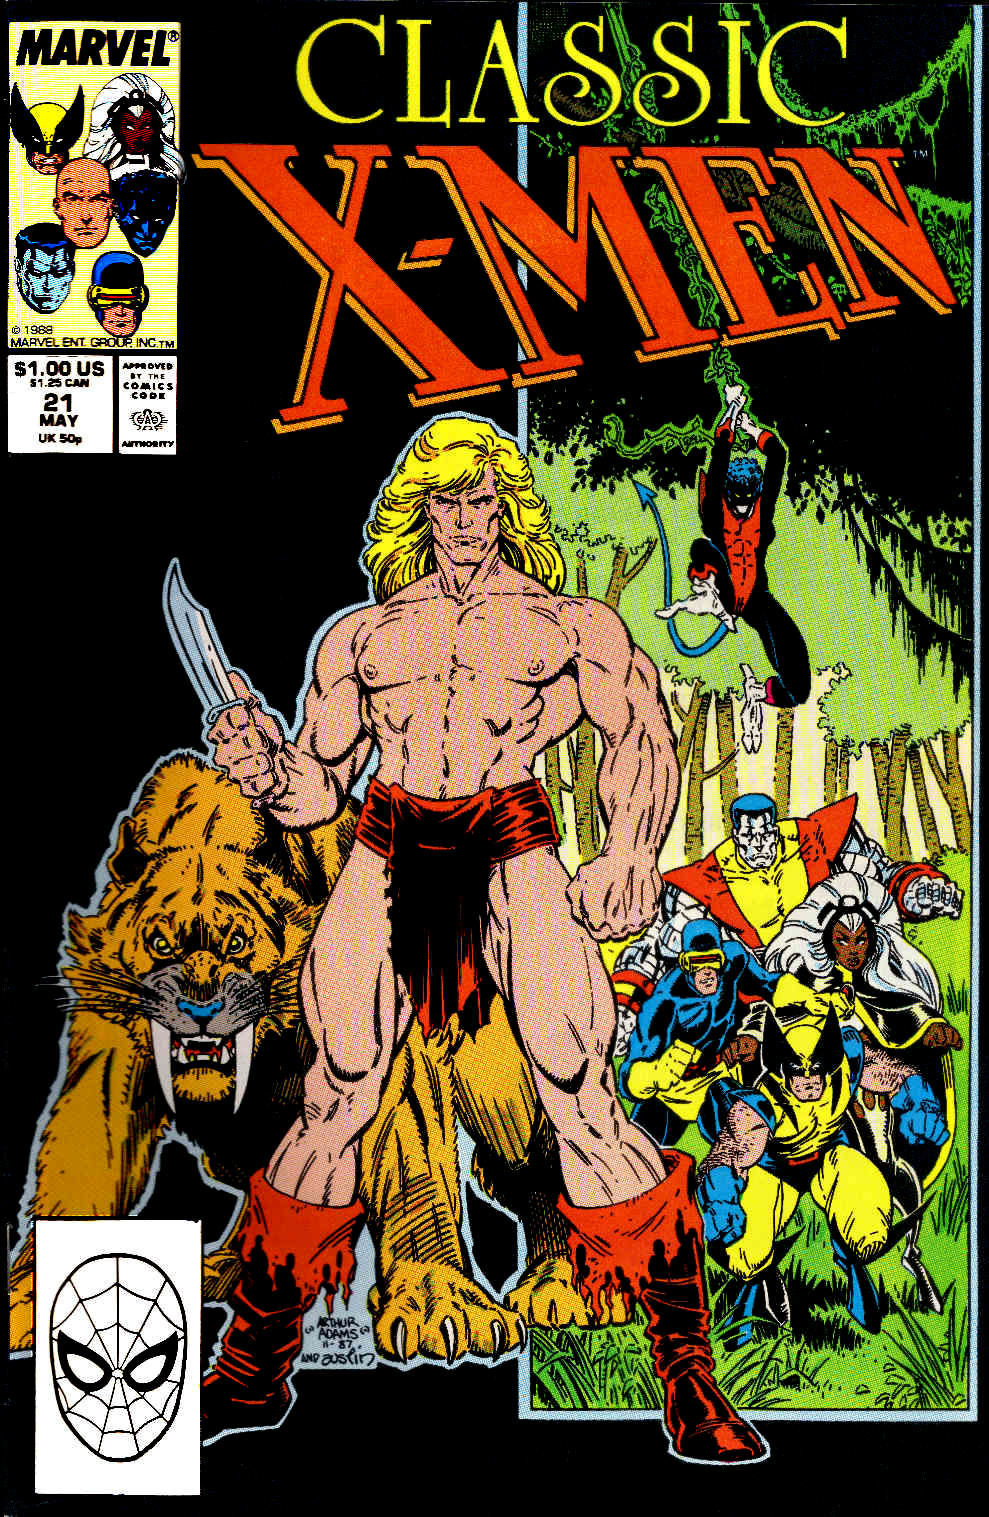 Classic X-Men 21 Page 1